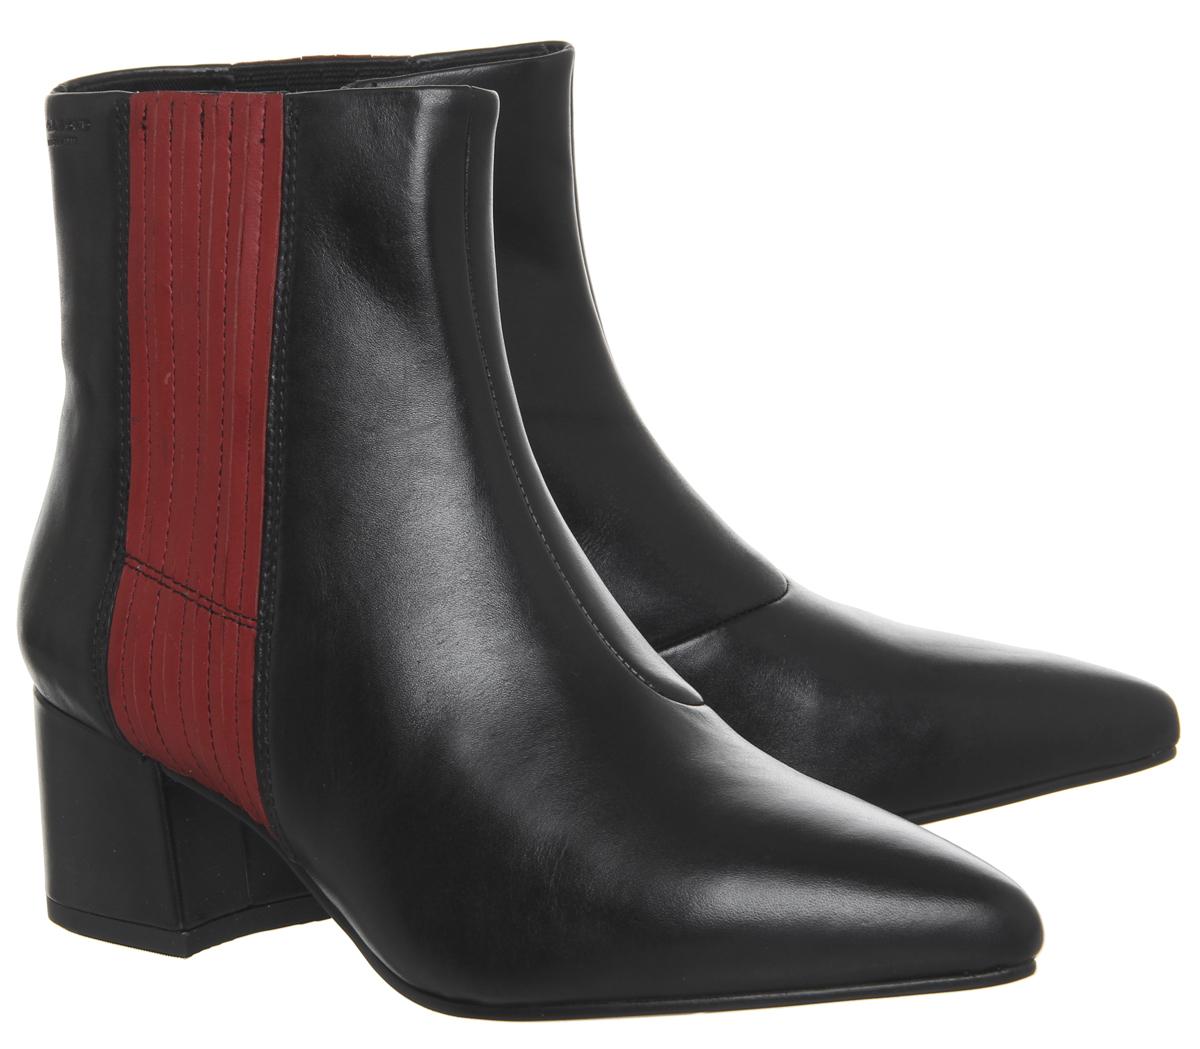 Mujer Botas al Tobillo Vagabond Negro MYA Botas Negro Vagabond Rojo a Rayas 4cc74d